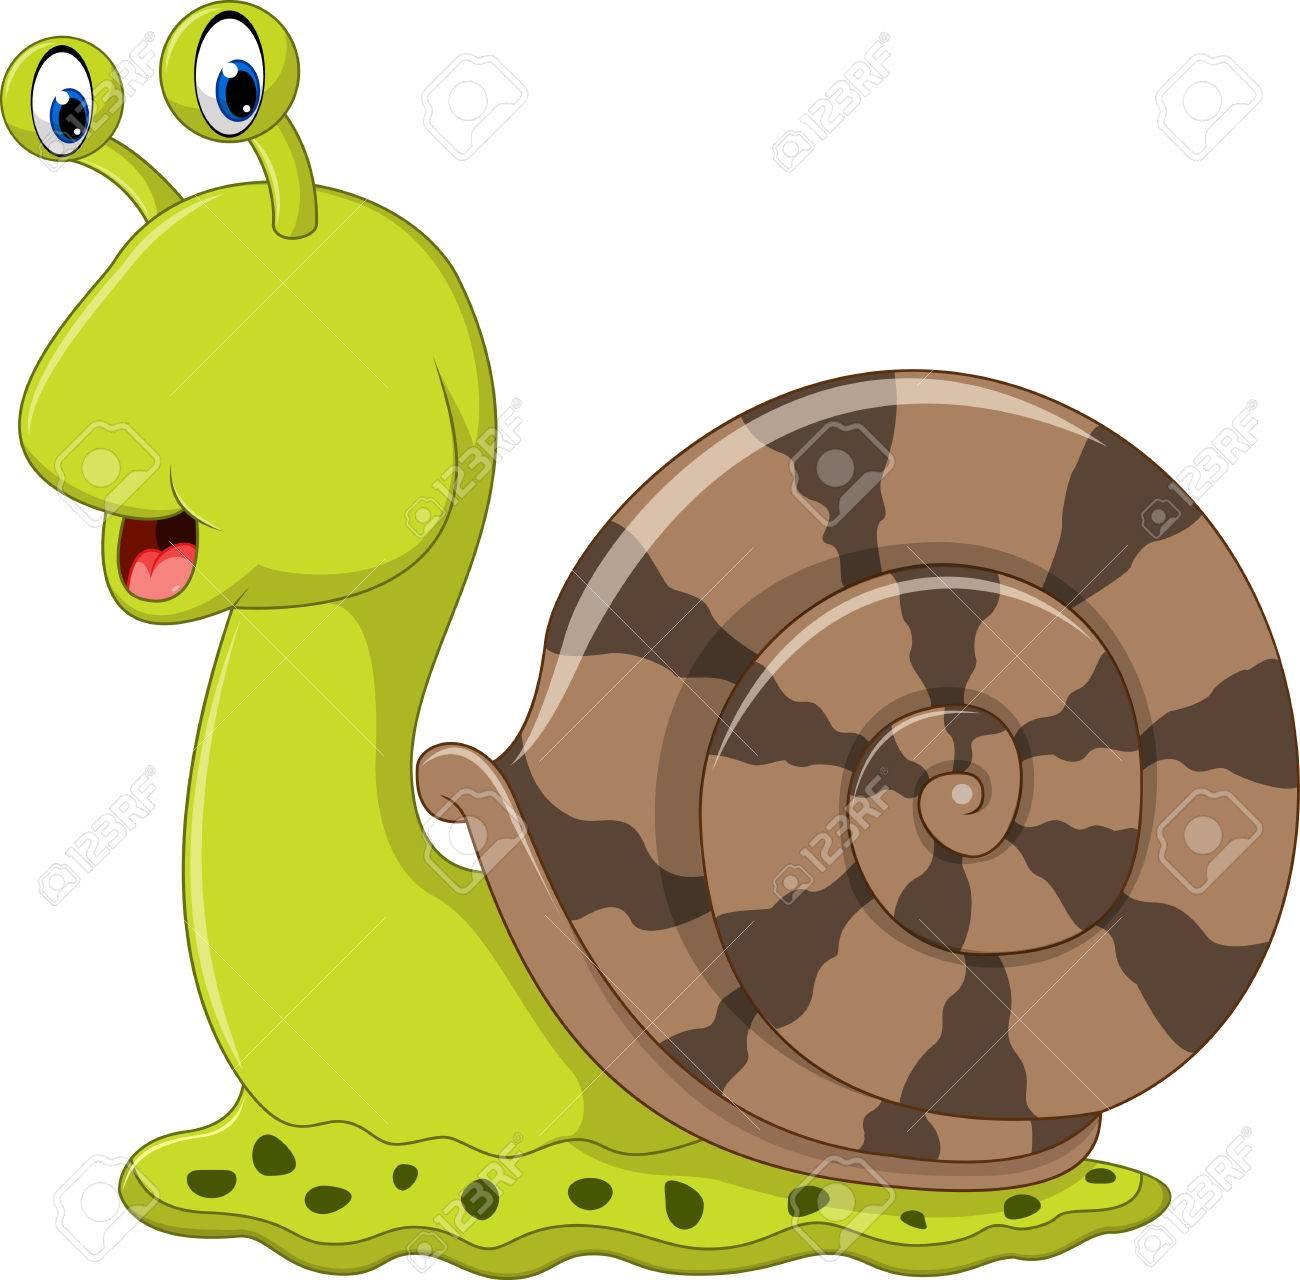 Cute snail cartoon.